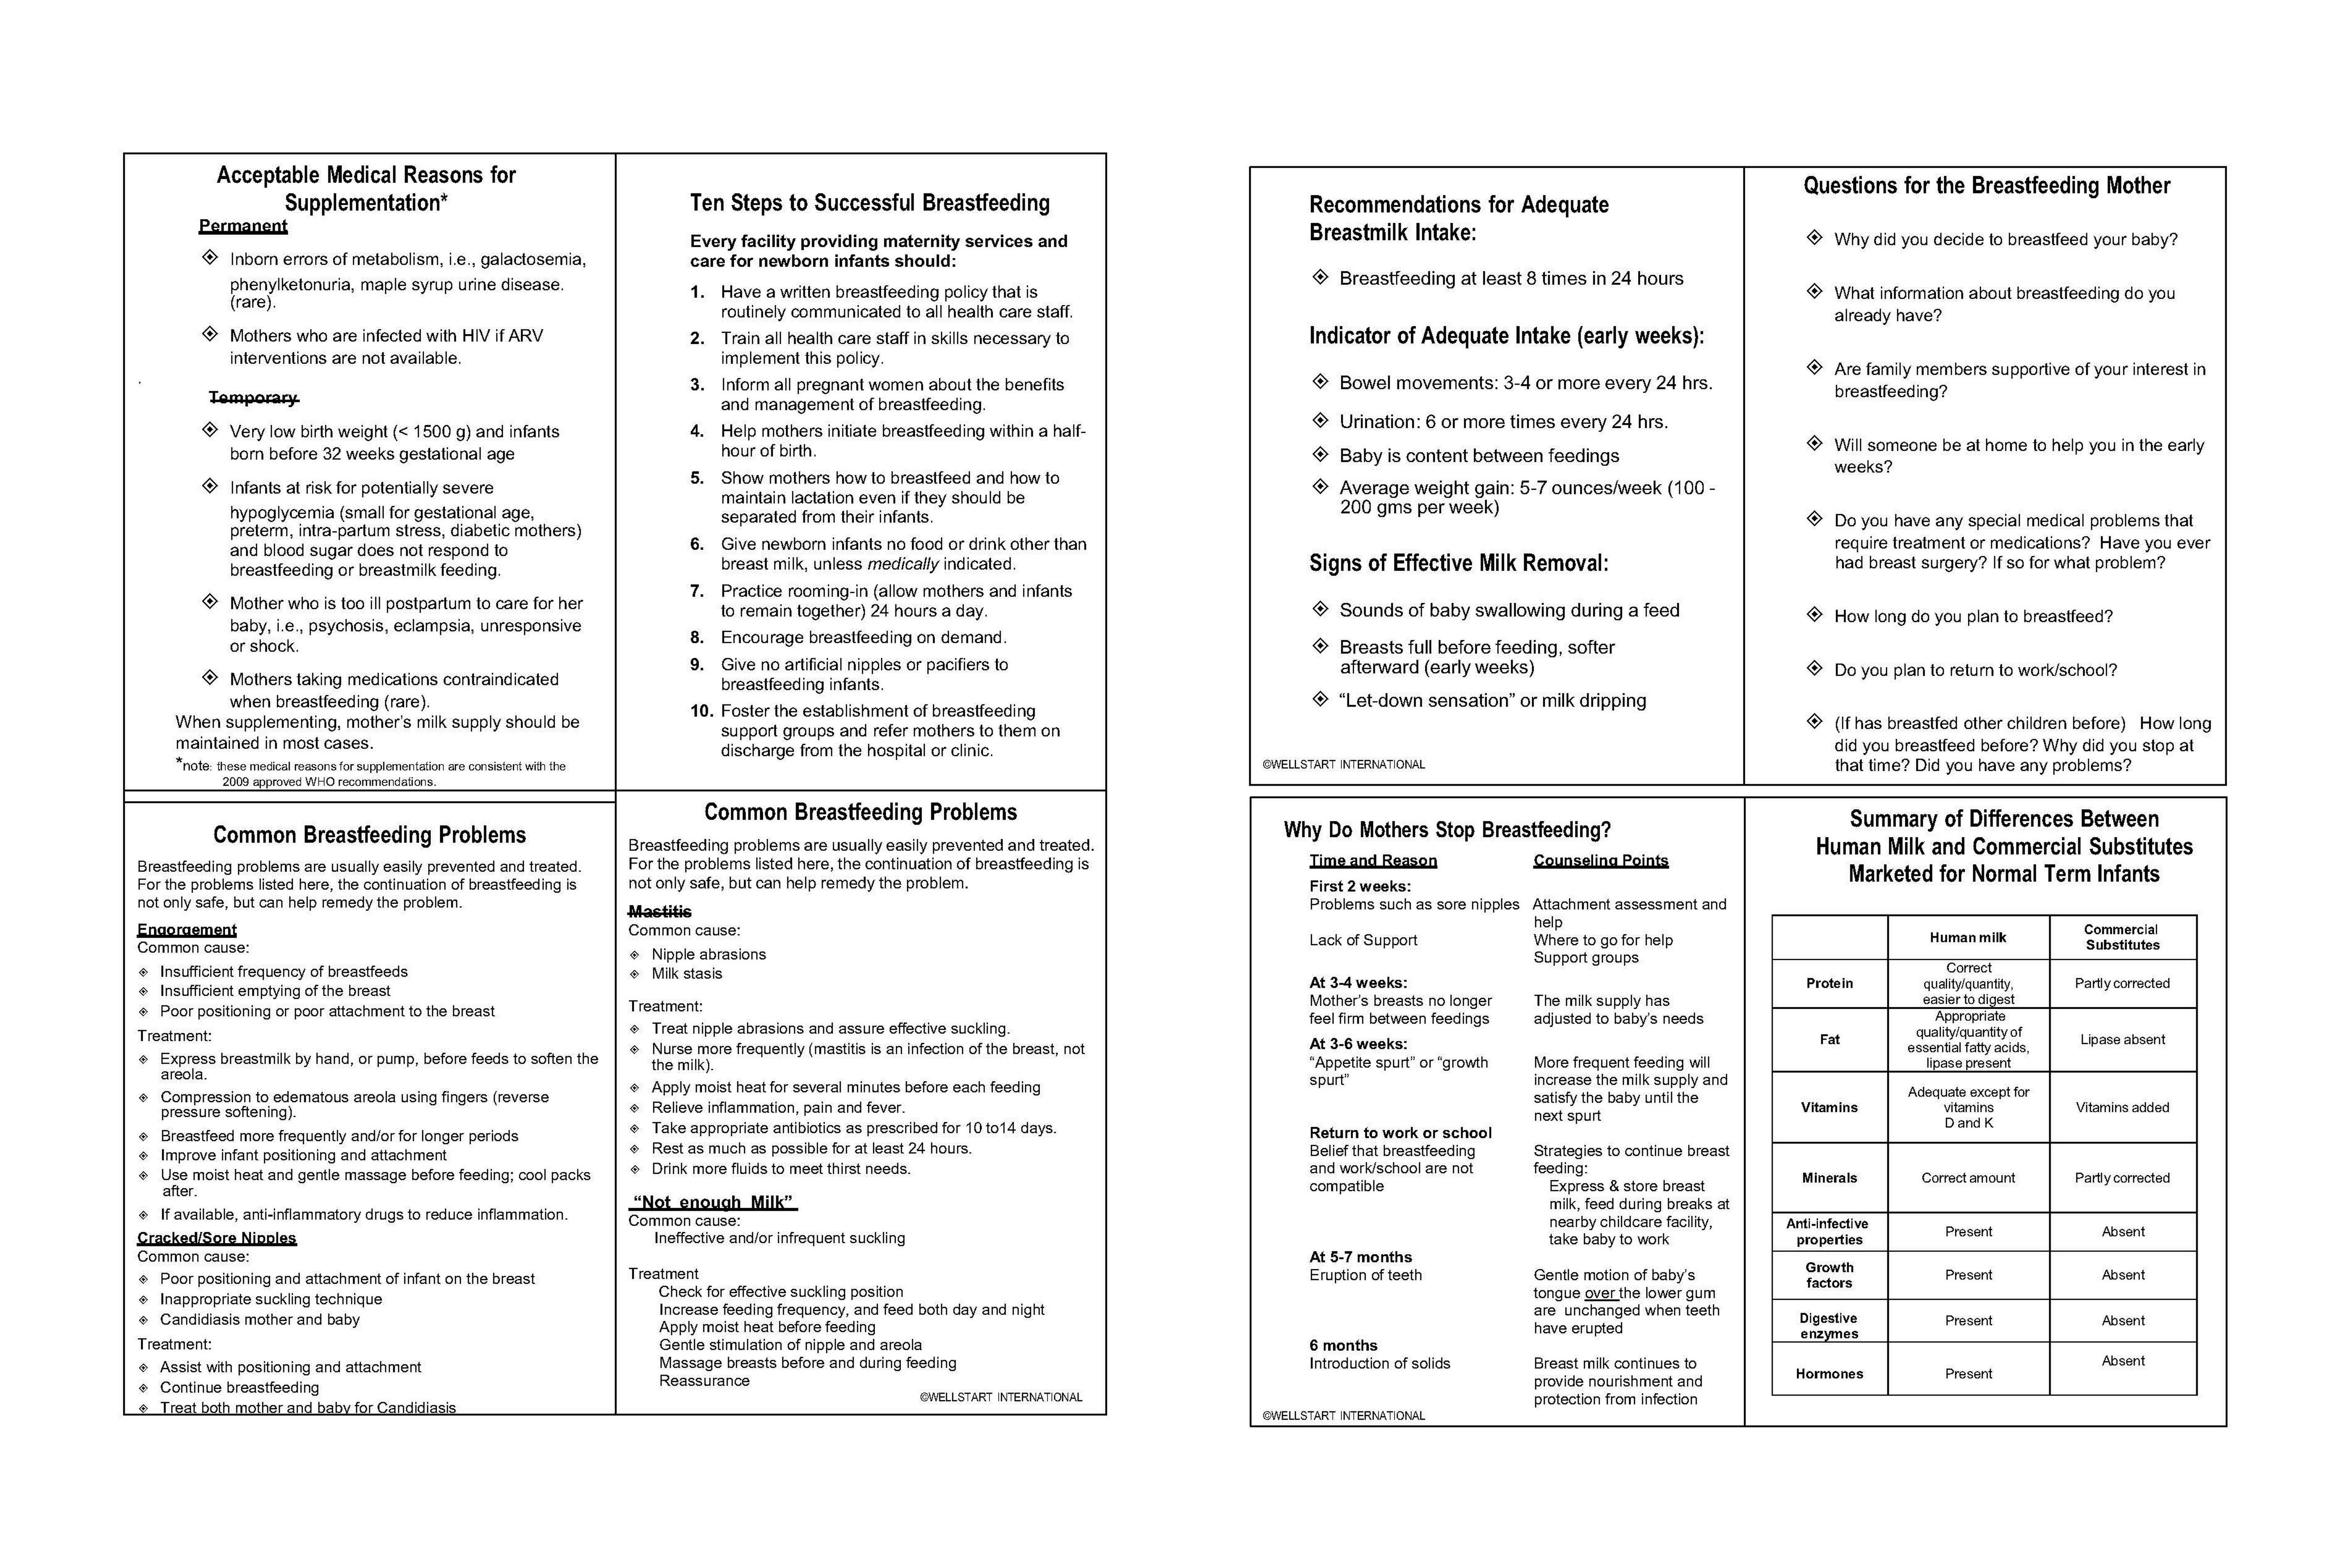 Free training galactablog wellstart cheat sheets 4 up 1betcityfo Choice Image